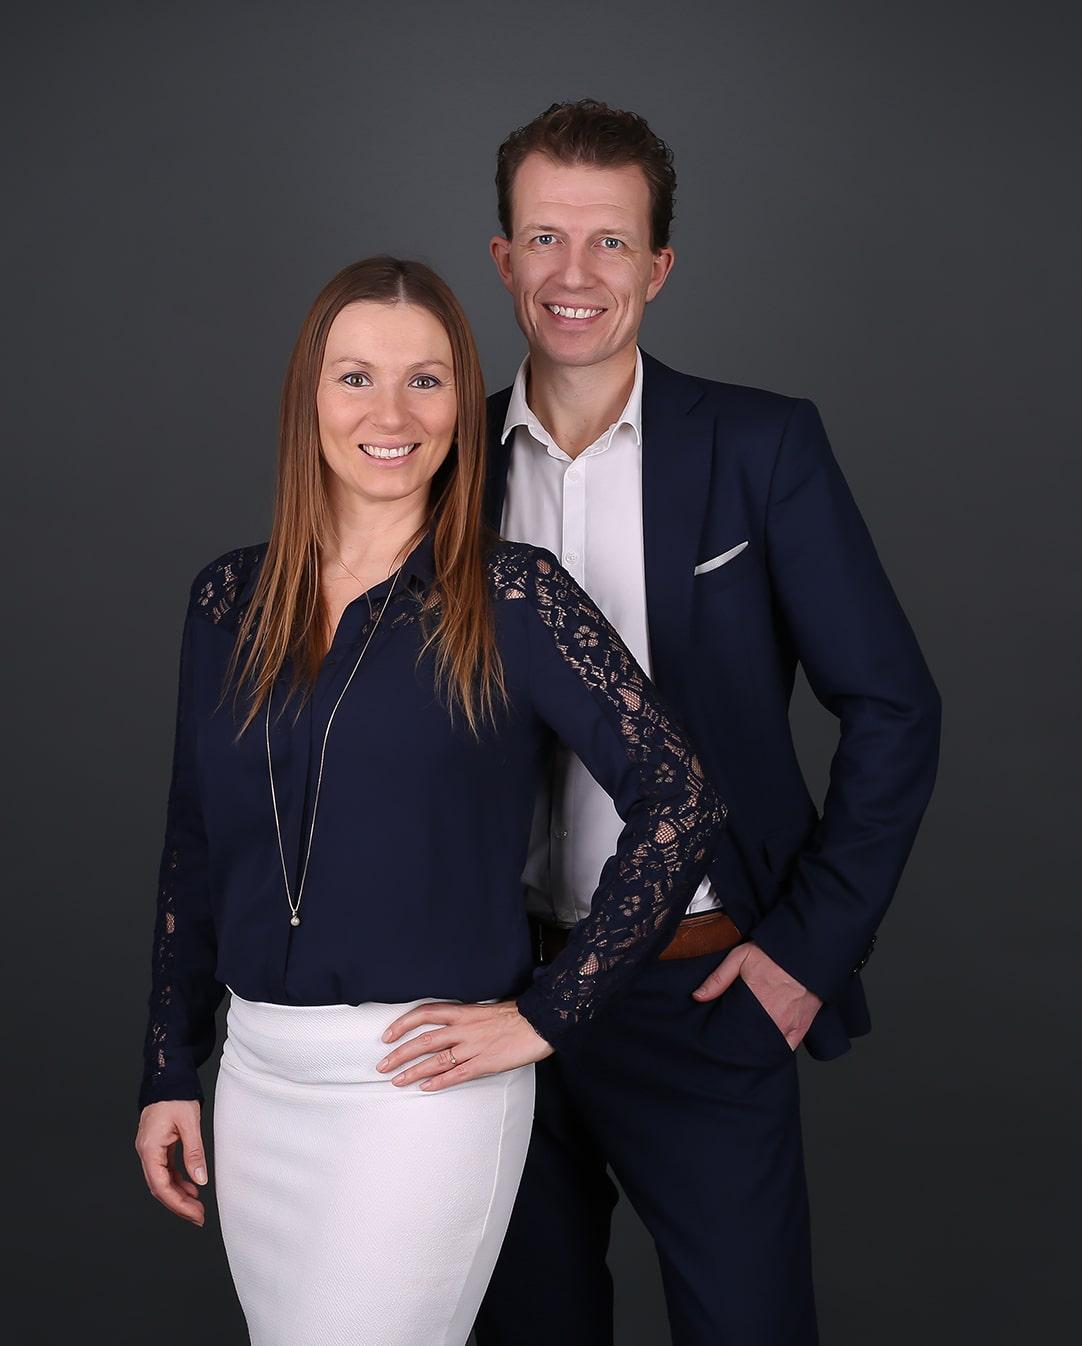 Kasper og Agniszka Wilstrup